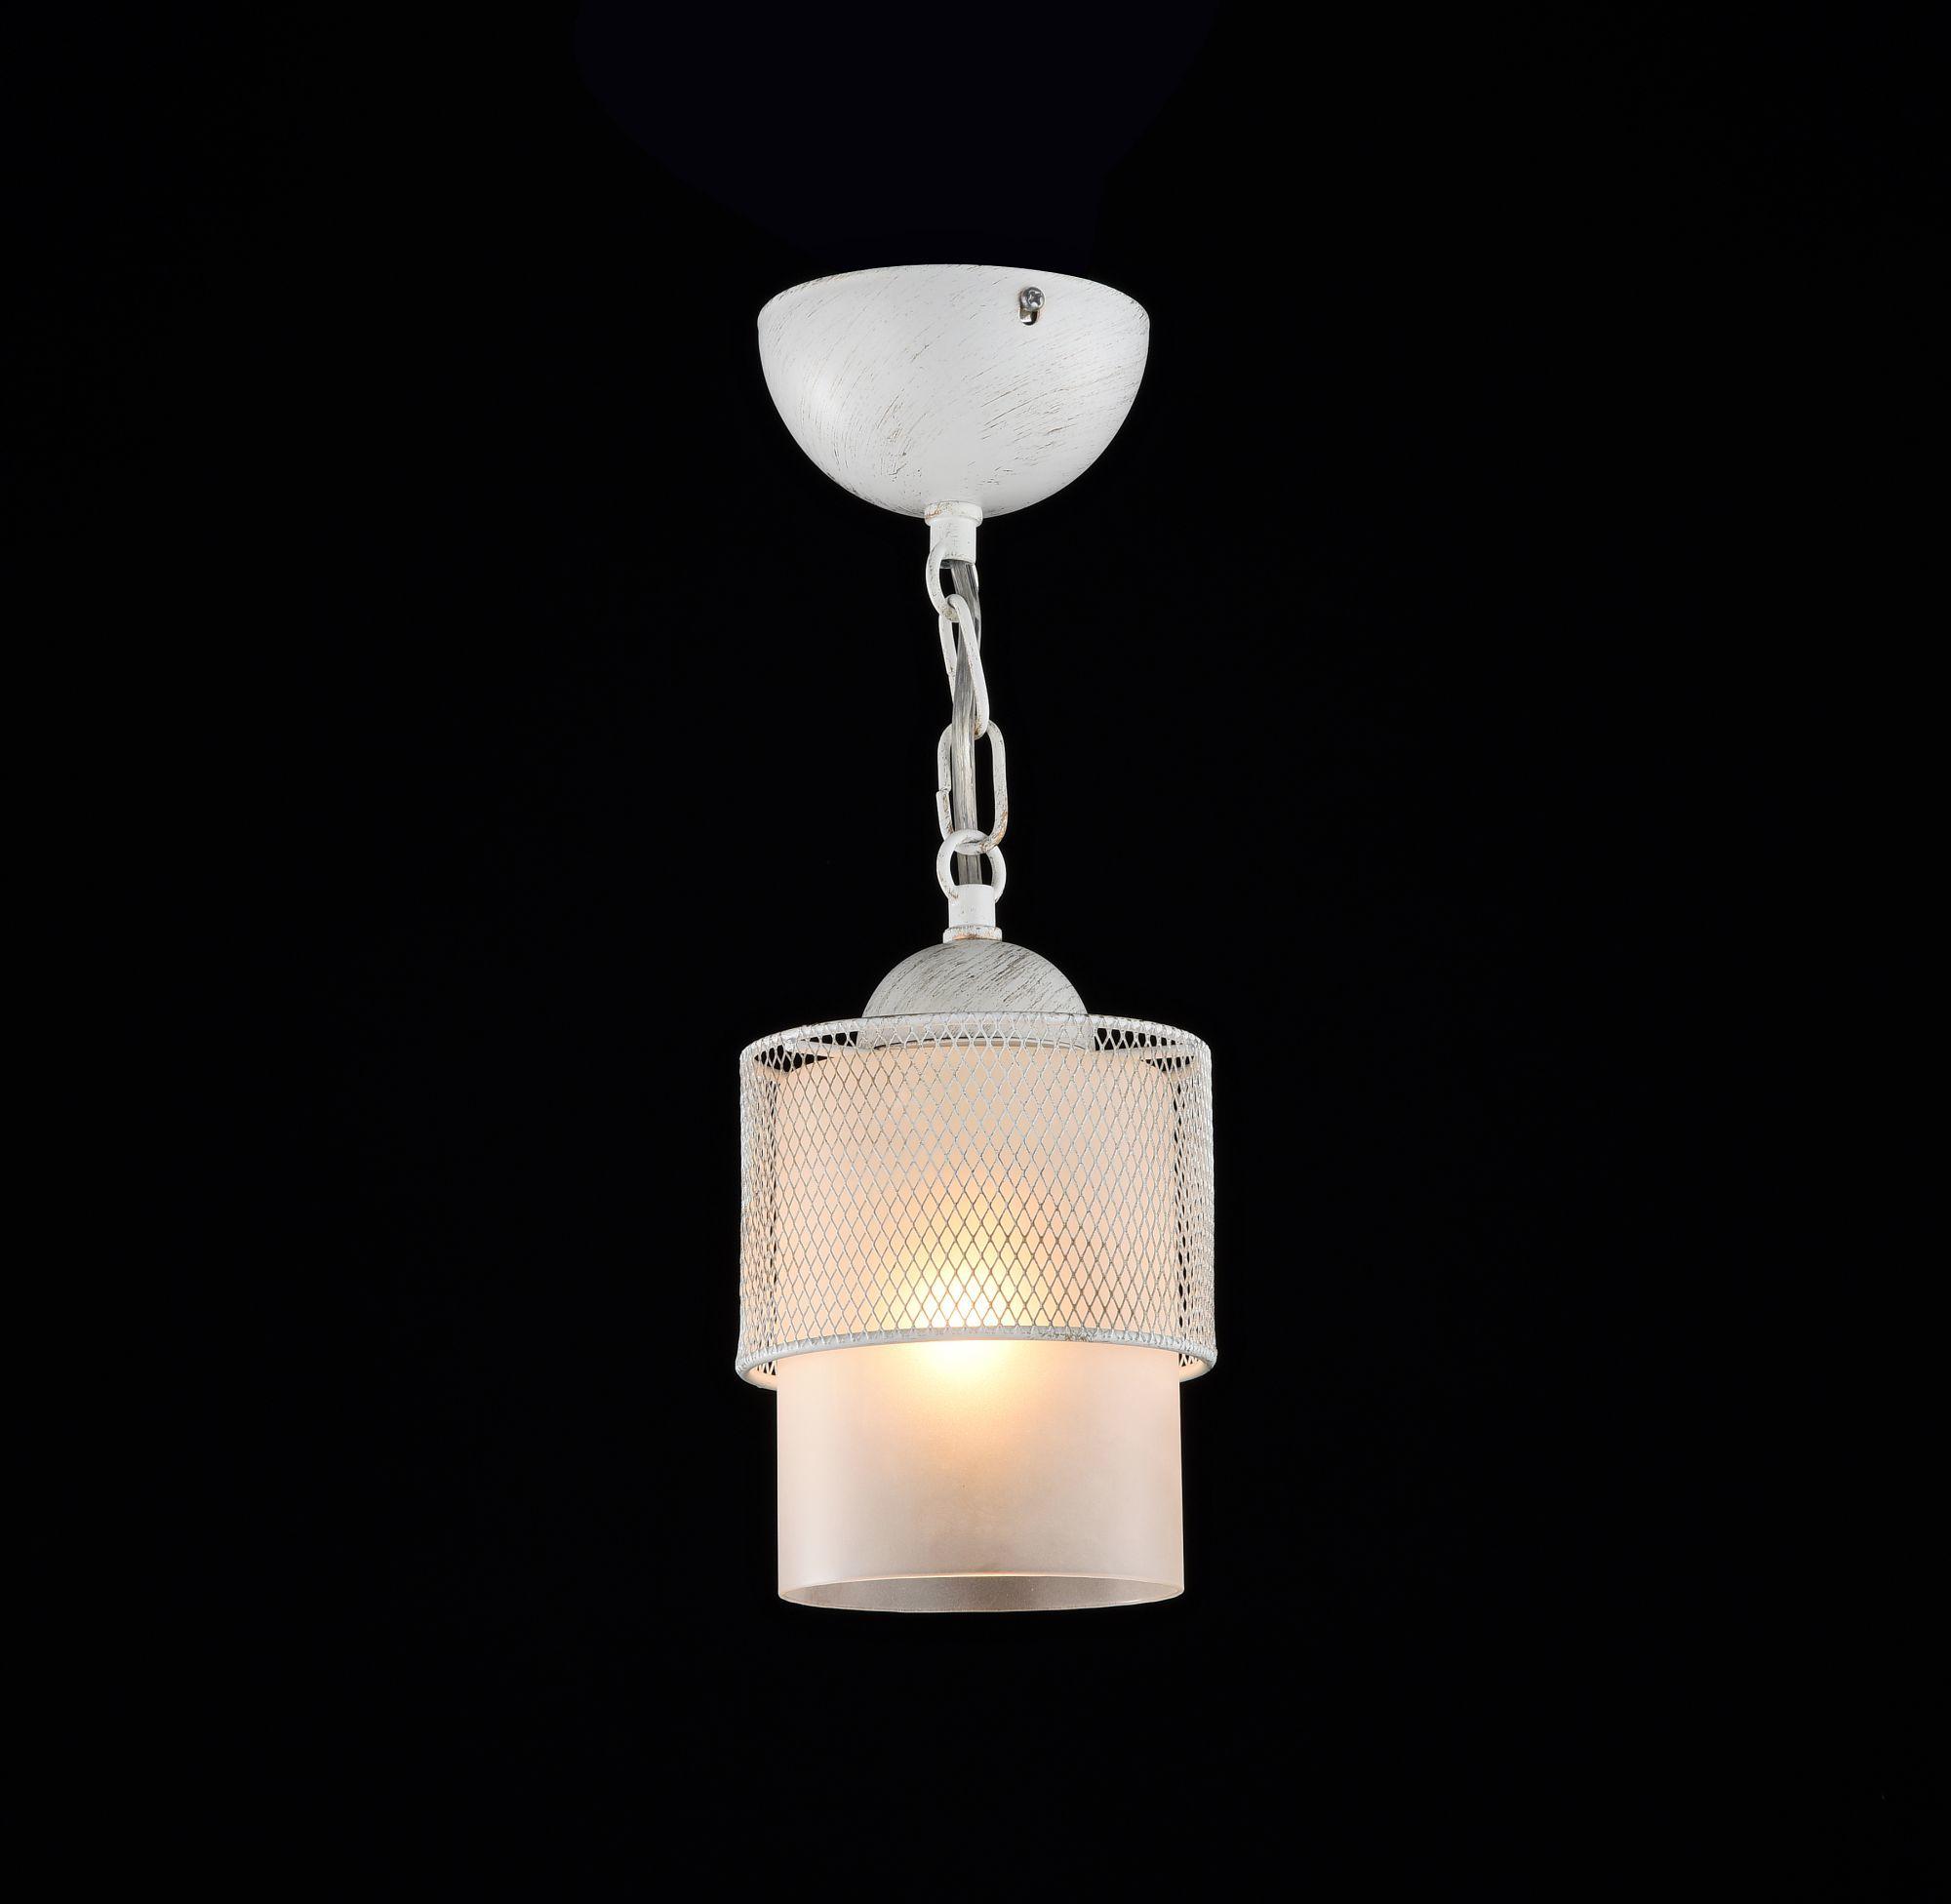 Подвесной светильник Freya Ornella FR2201-PL-01-WG (fr201-11-w), 1xE27x60W, белый, металл, металл со стеклом/пластиком - фото 3